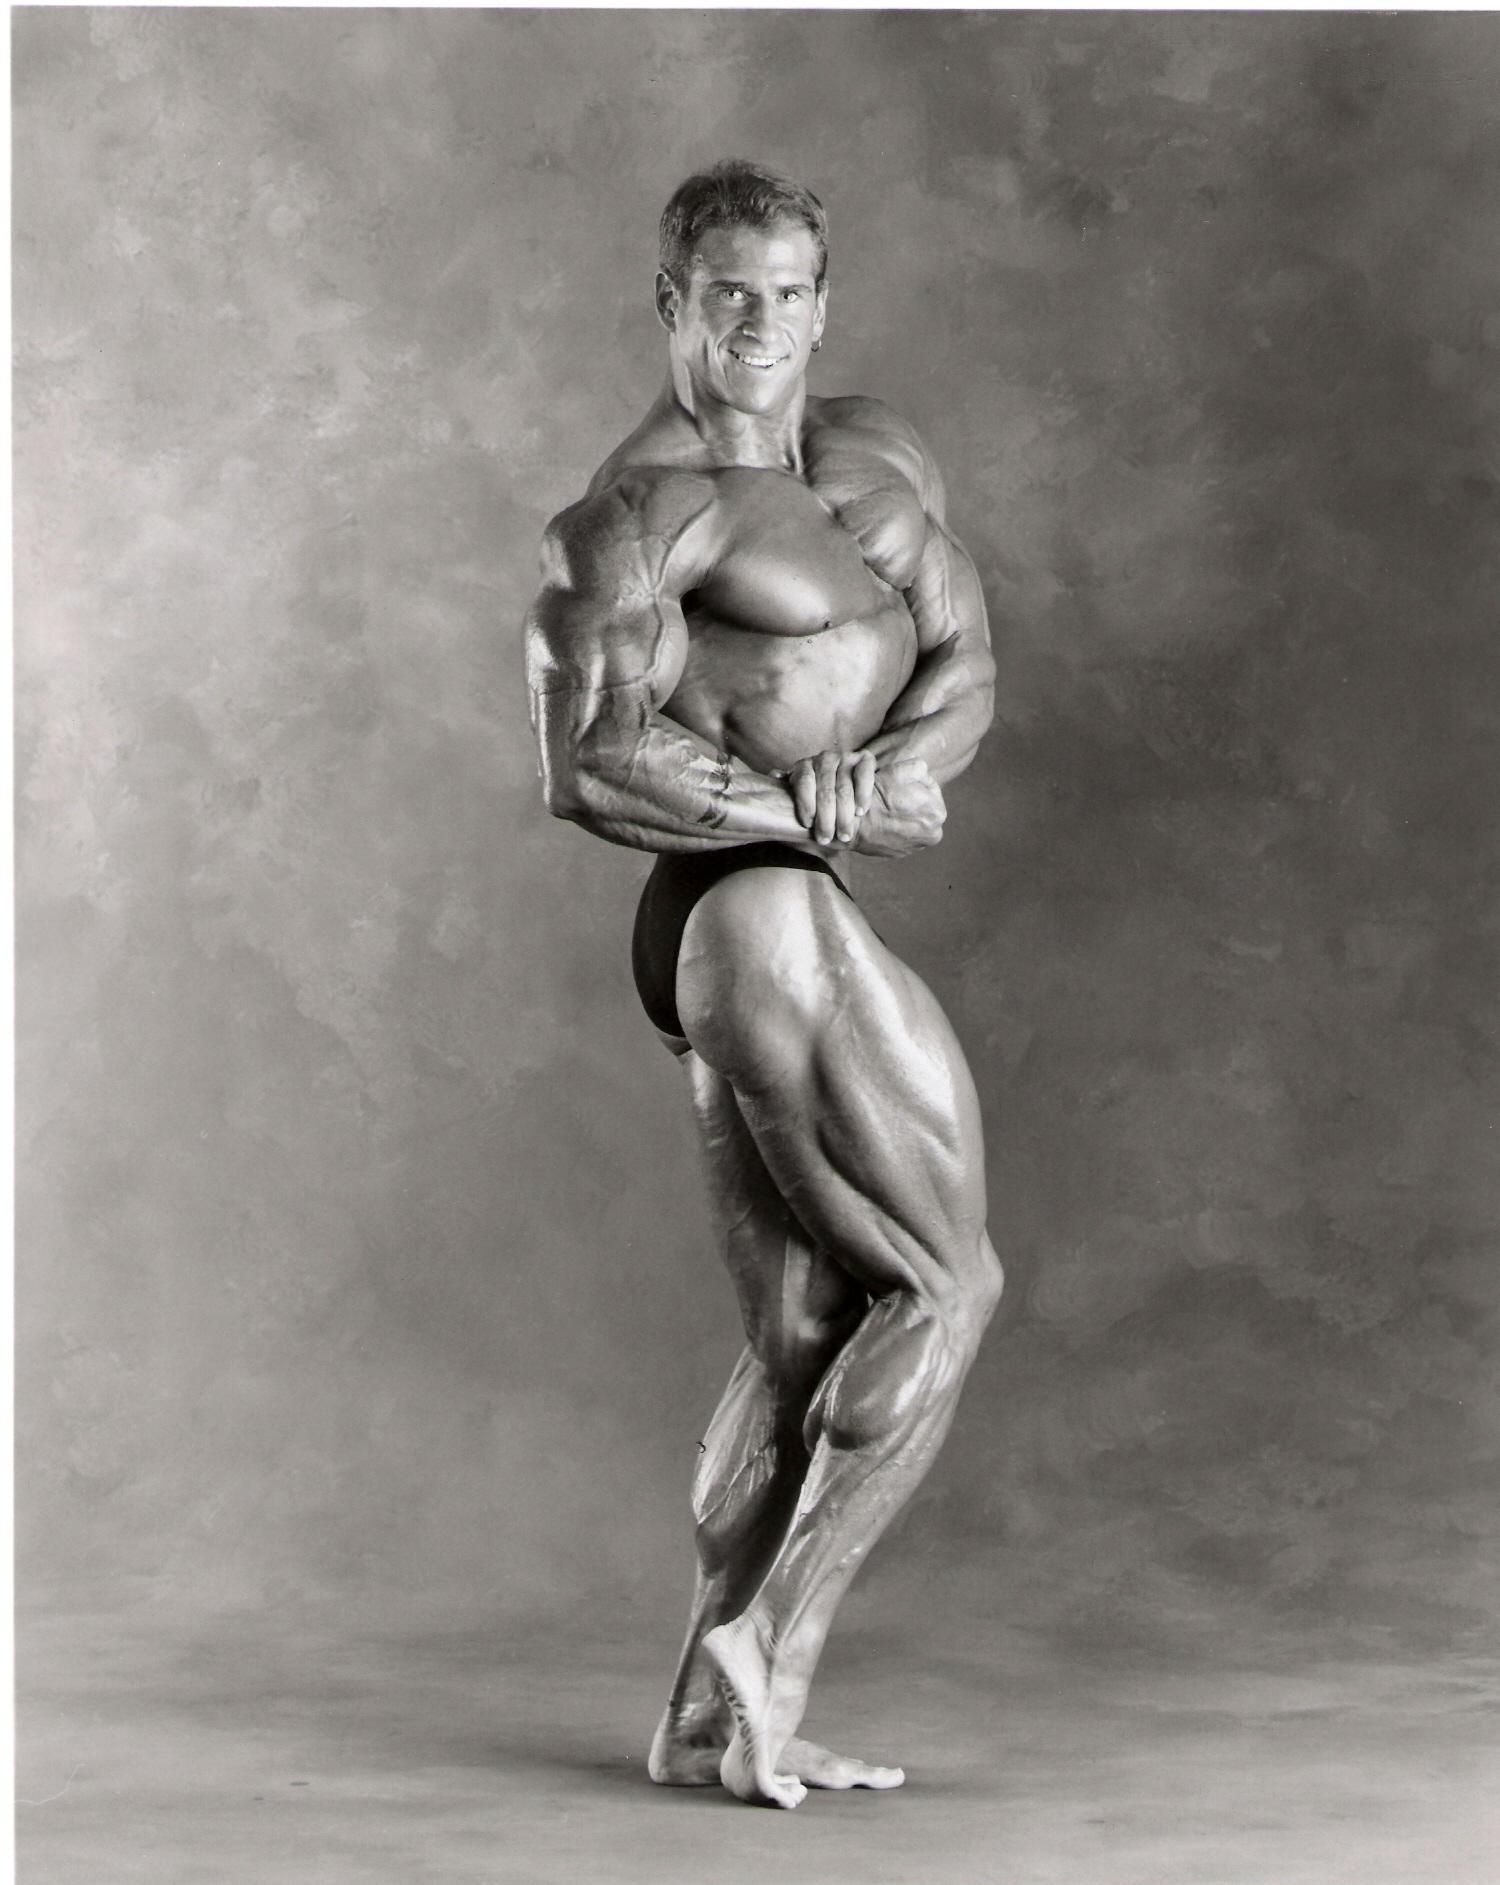 File:Tom Terwilliger, NPC National Champion.jpg